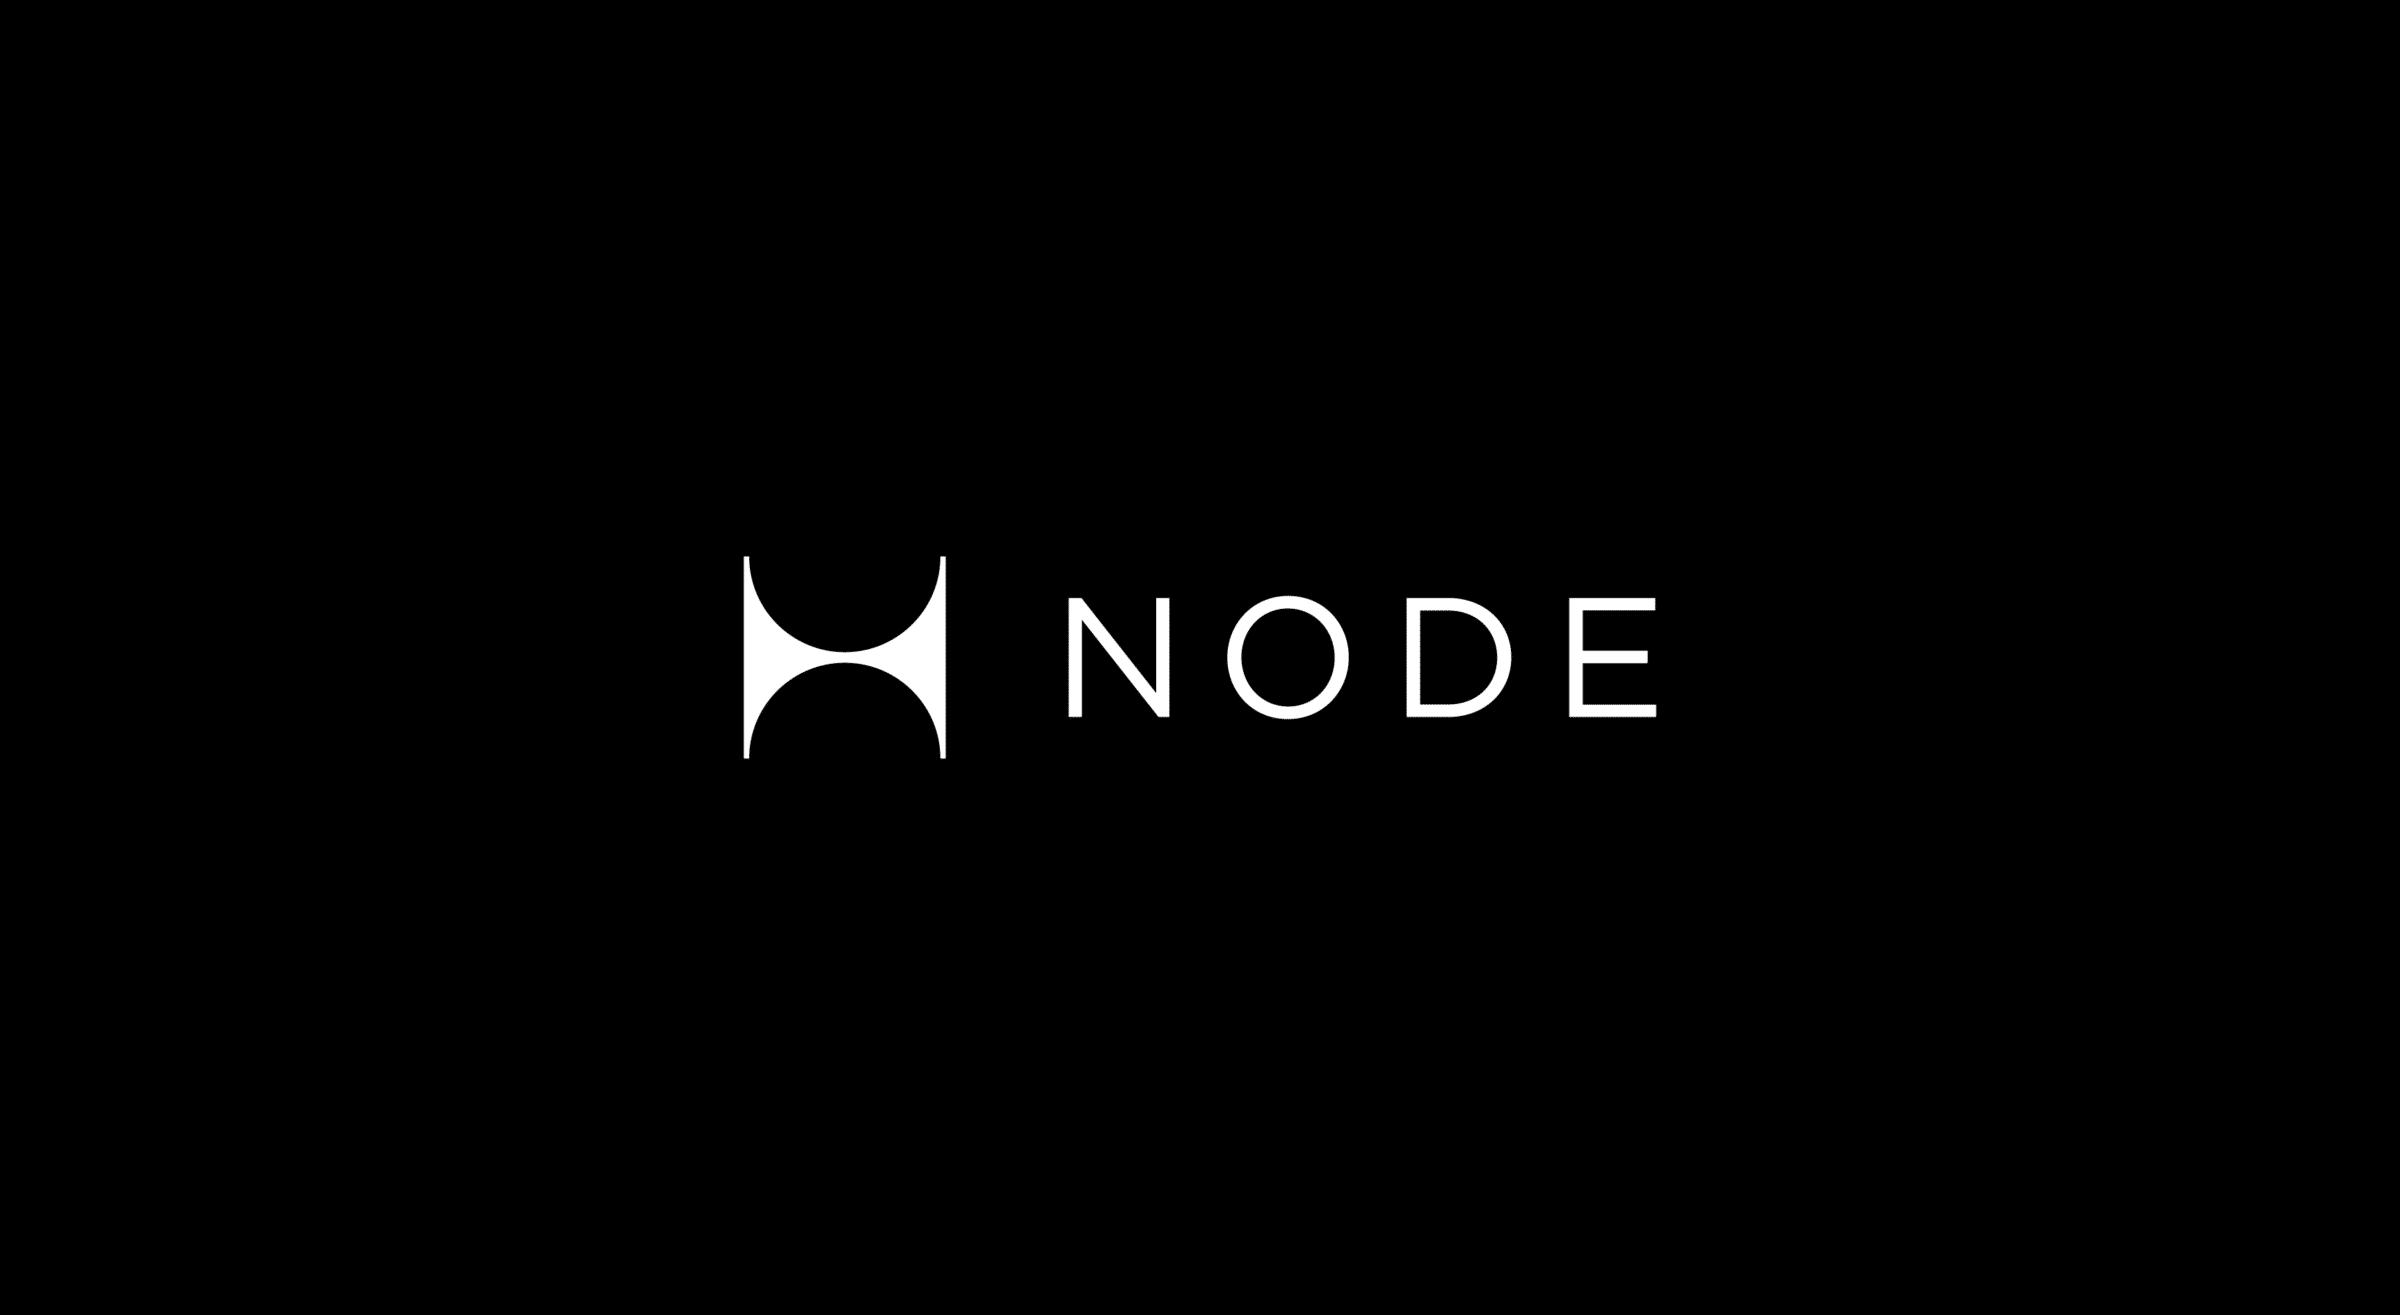 Logo design for Node